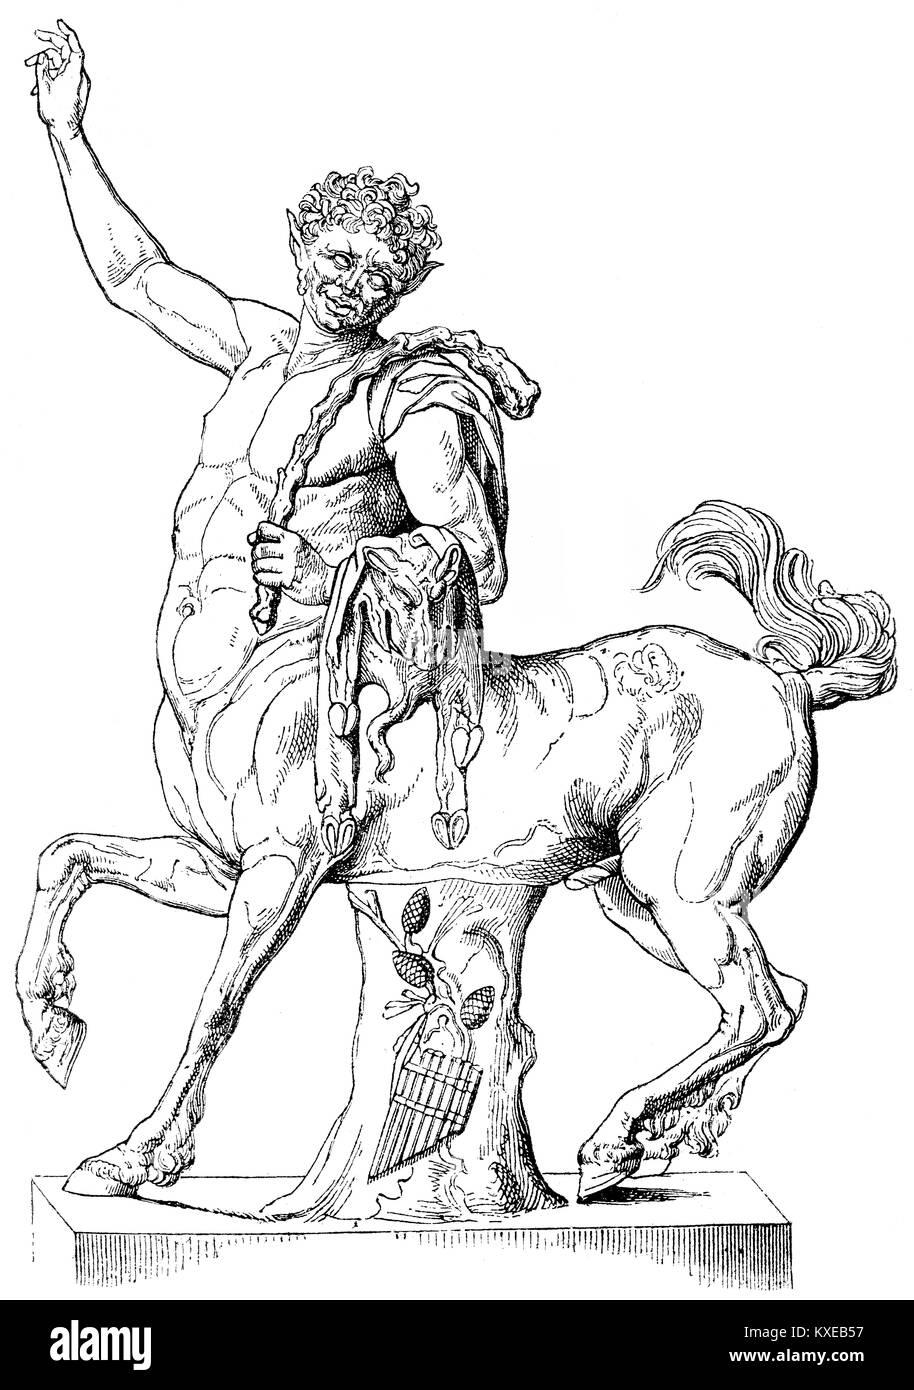 A centaur, Greek mythology - Stock Image